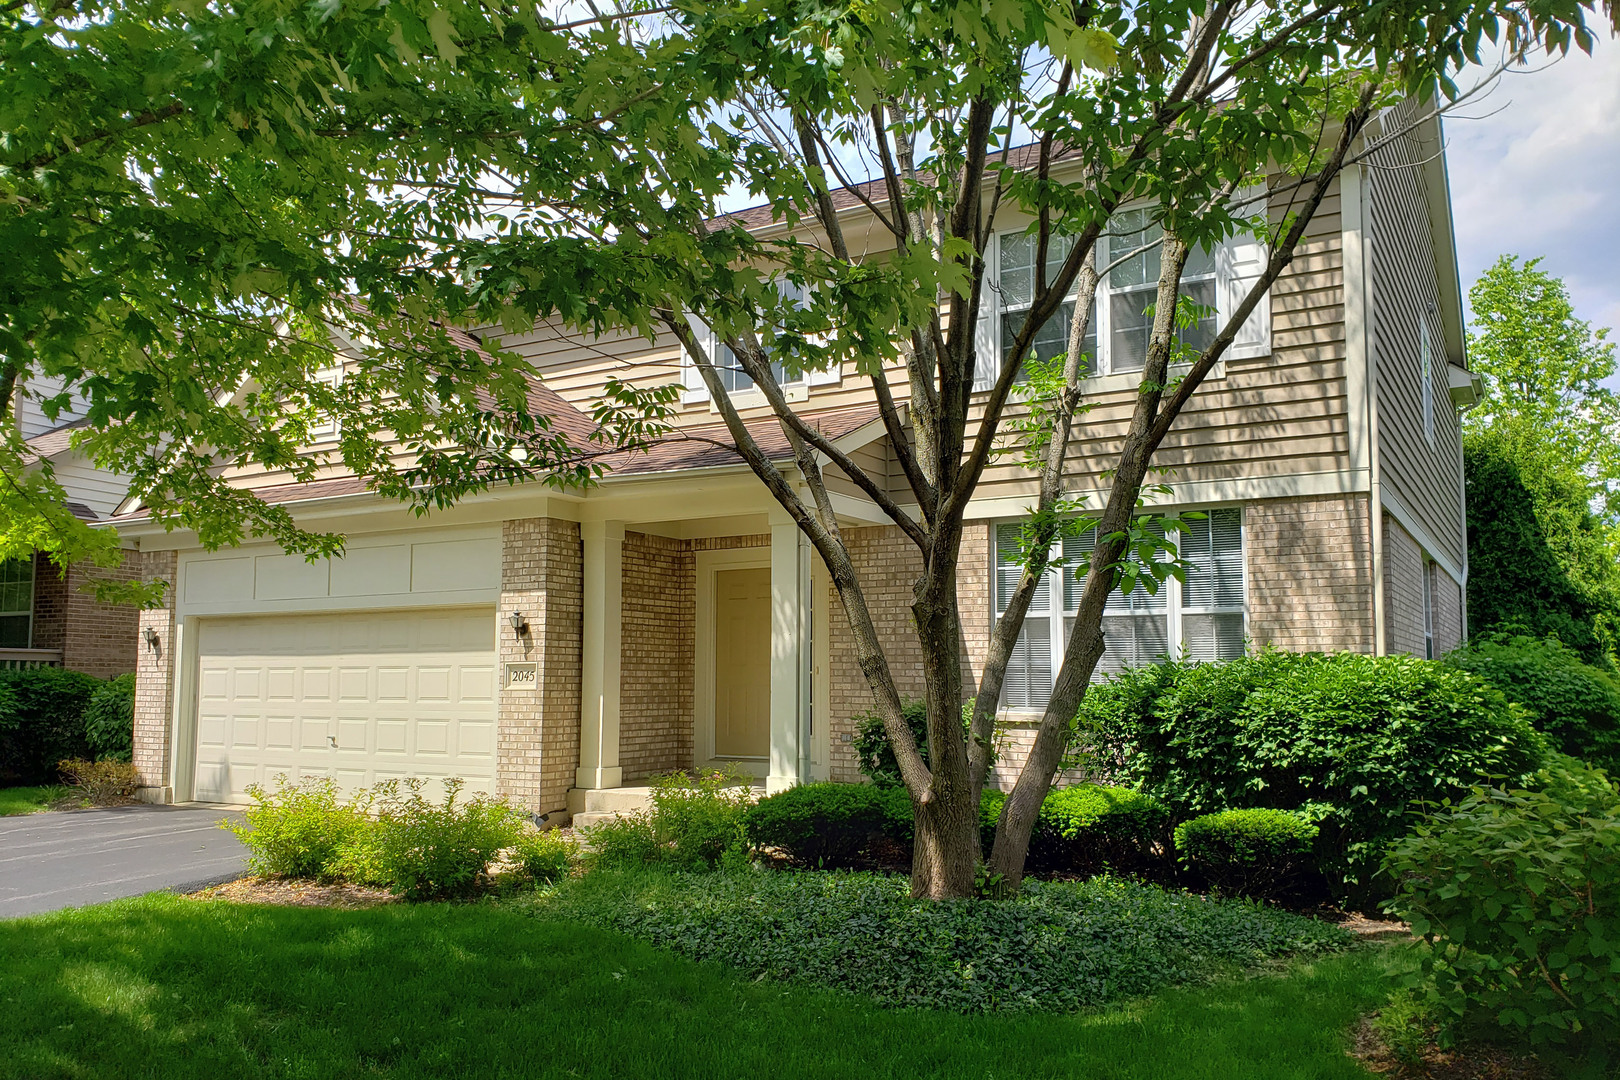 2045 Trevino Terrace, Vernon Hills, Illinois 60061